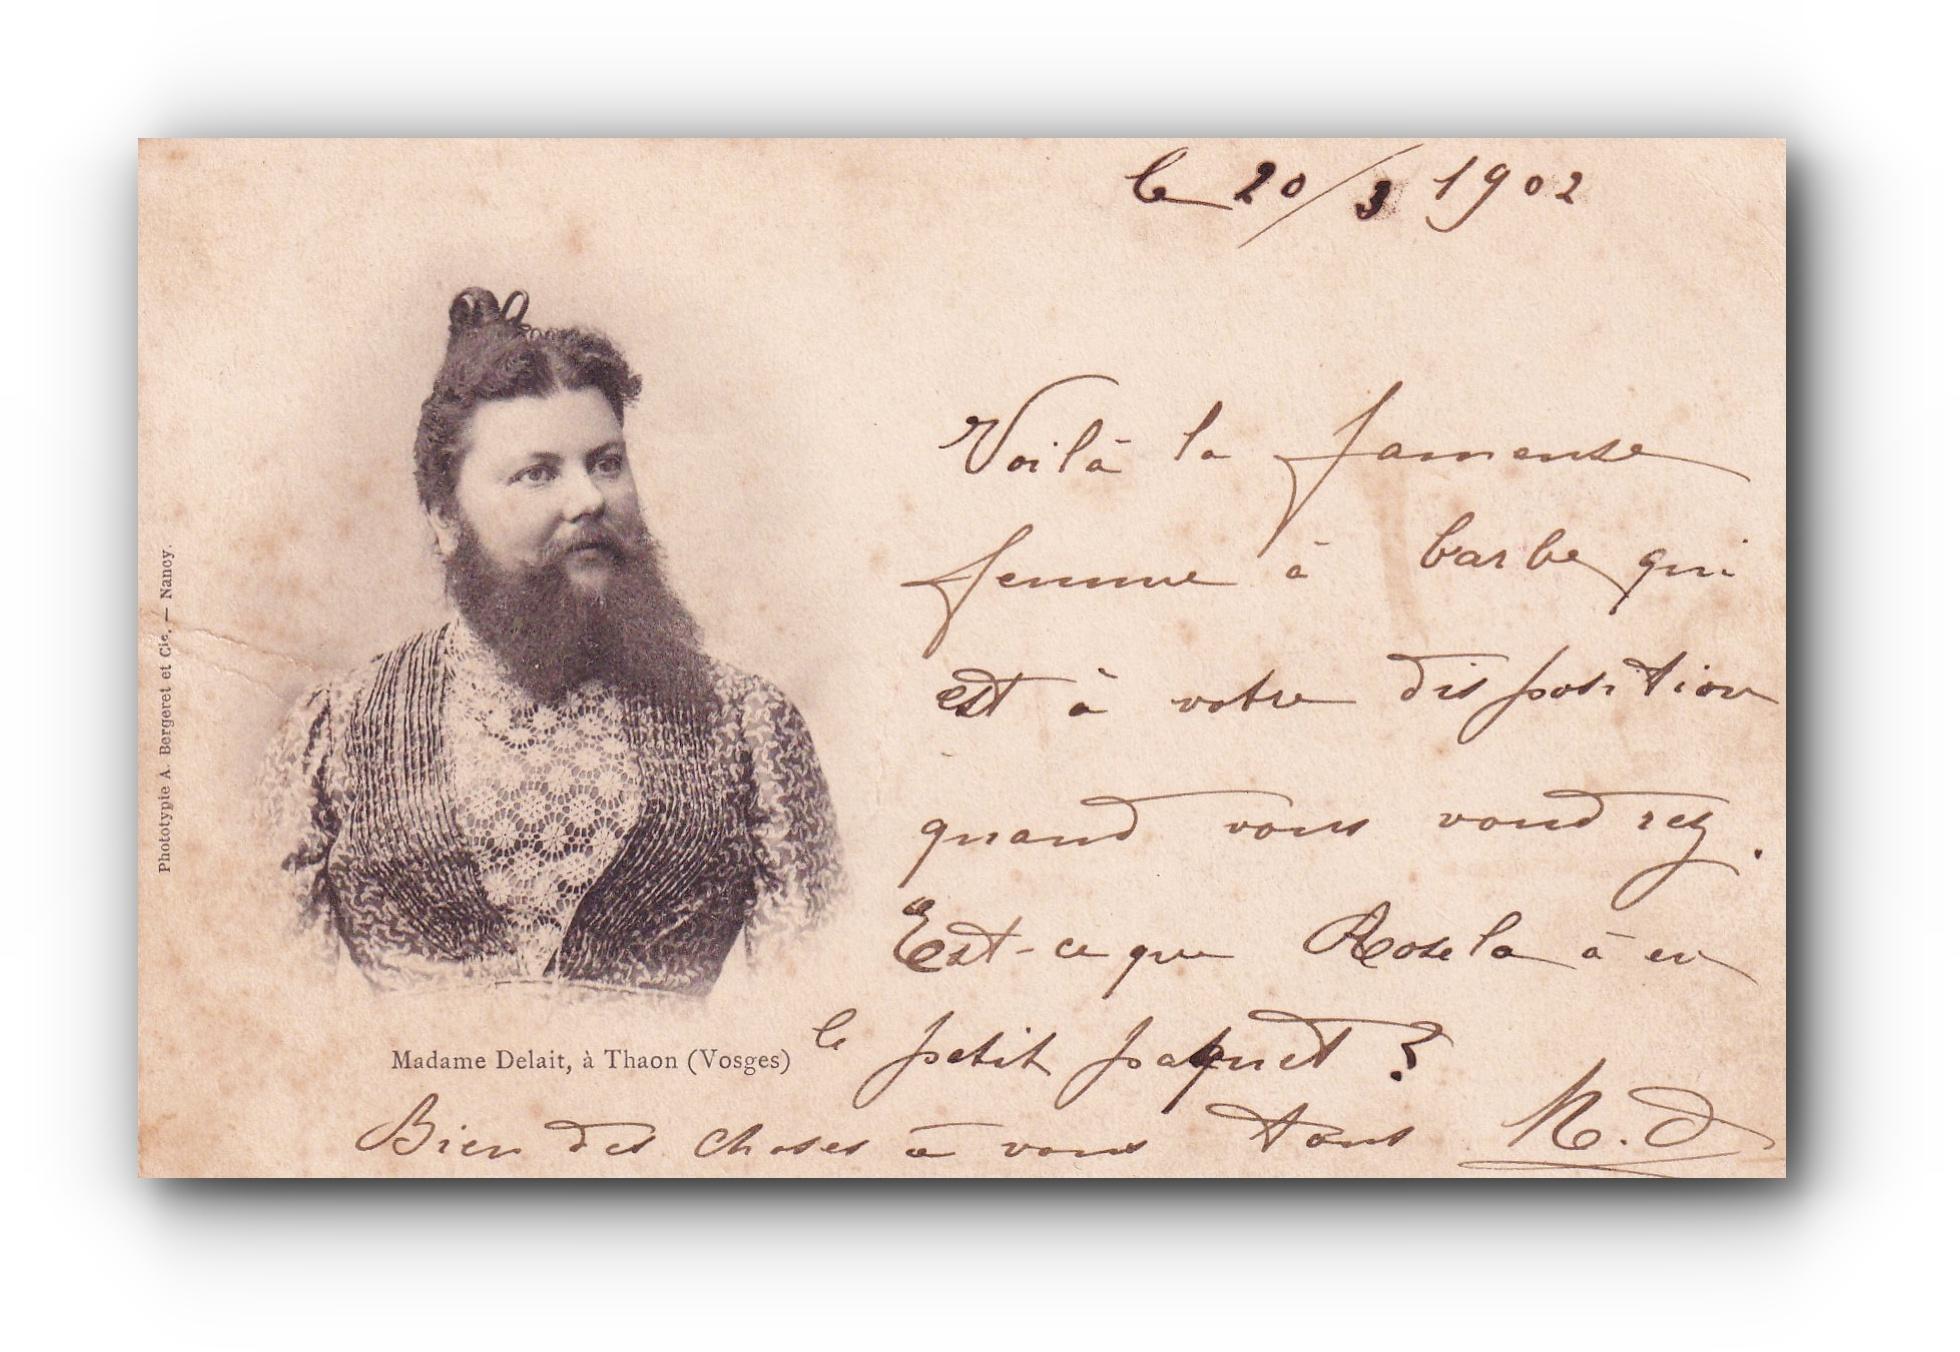 Madame Delait - 20.03.1902